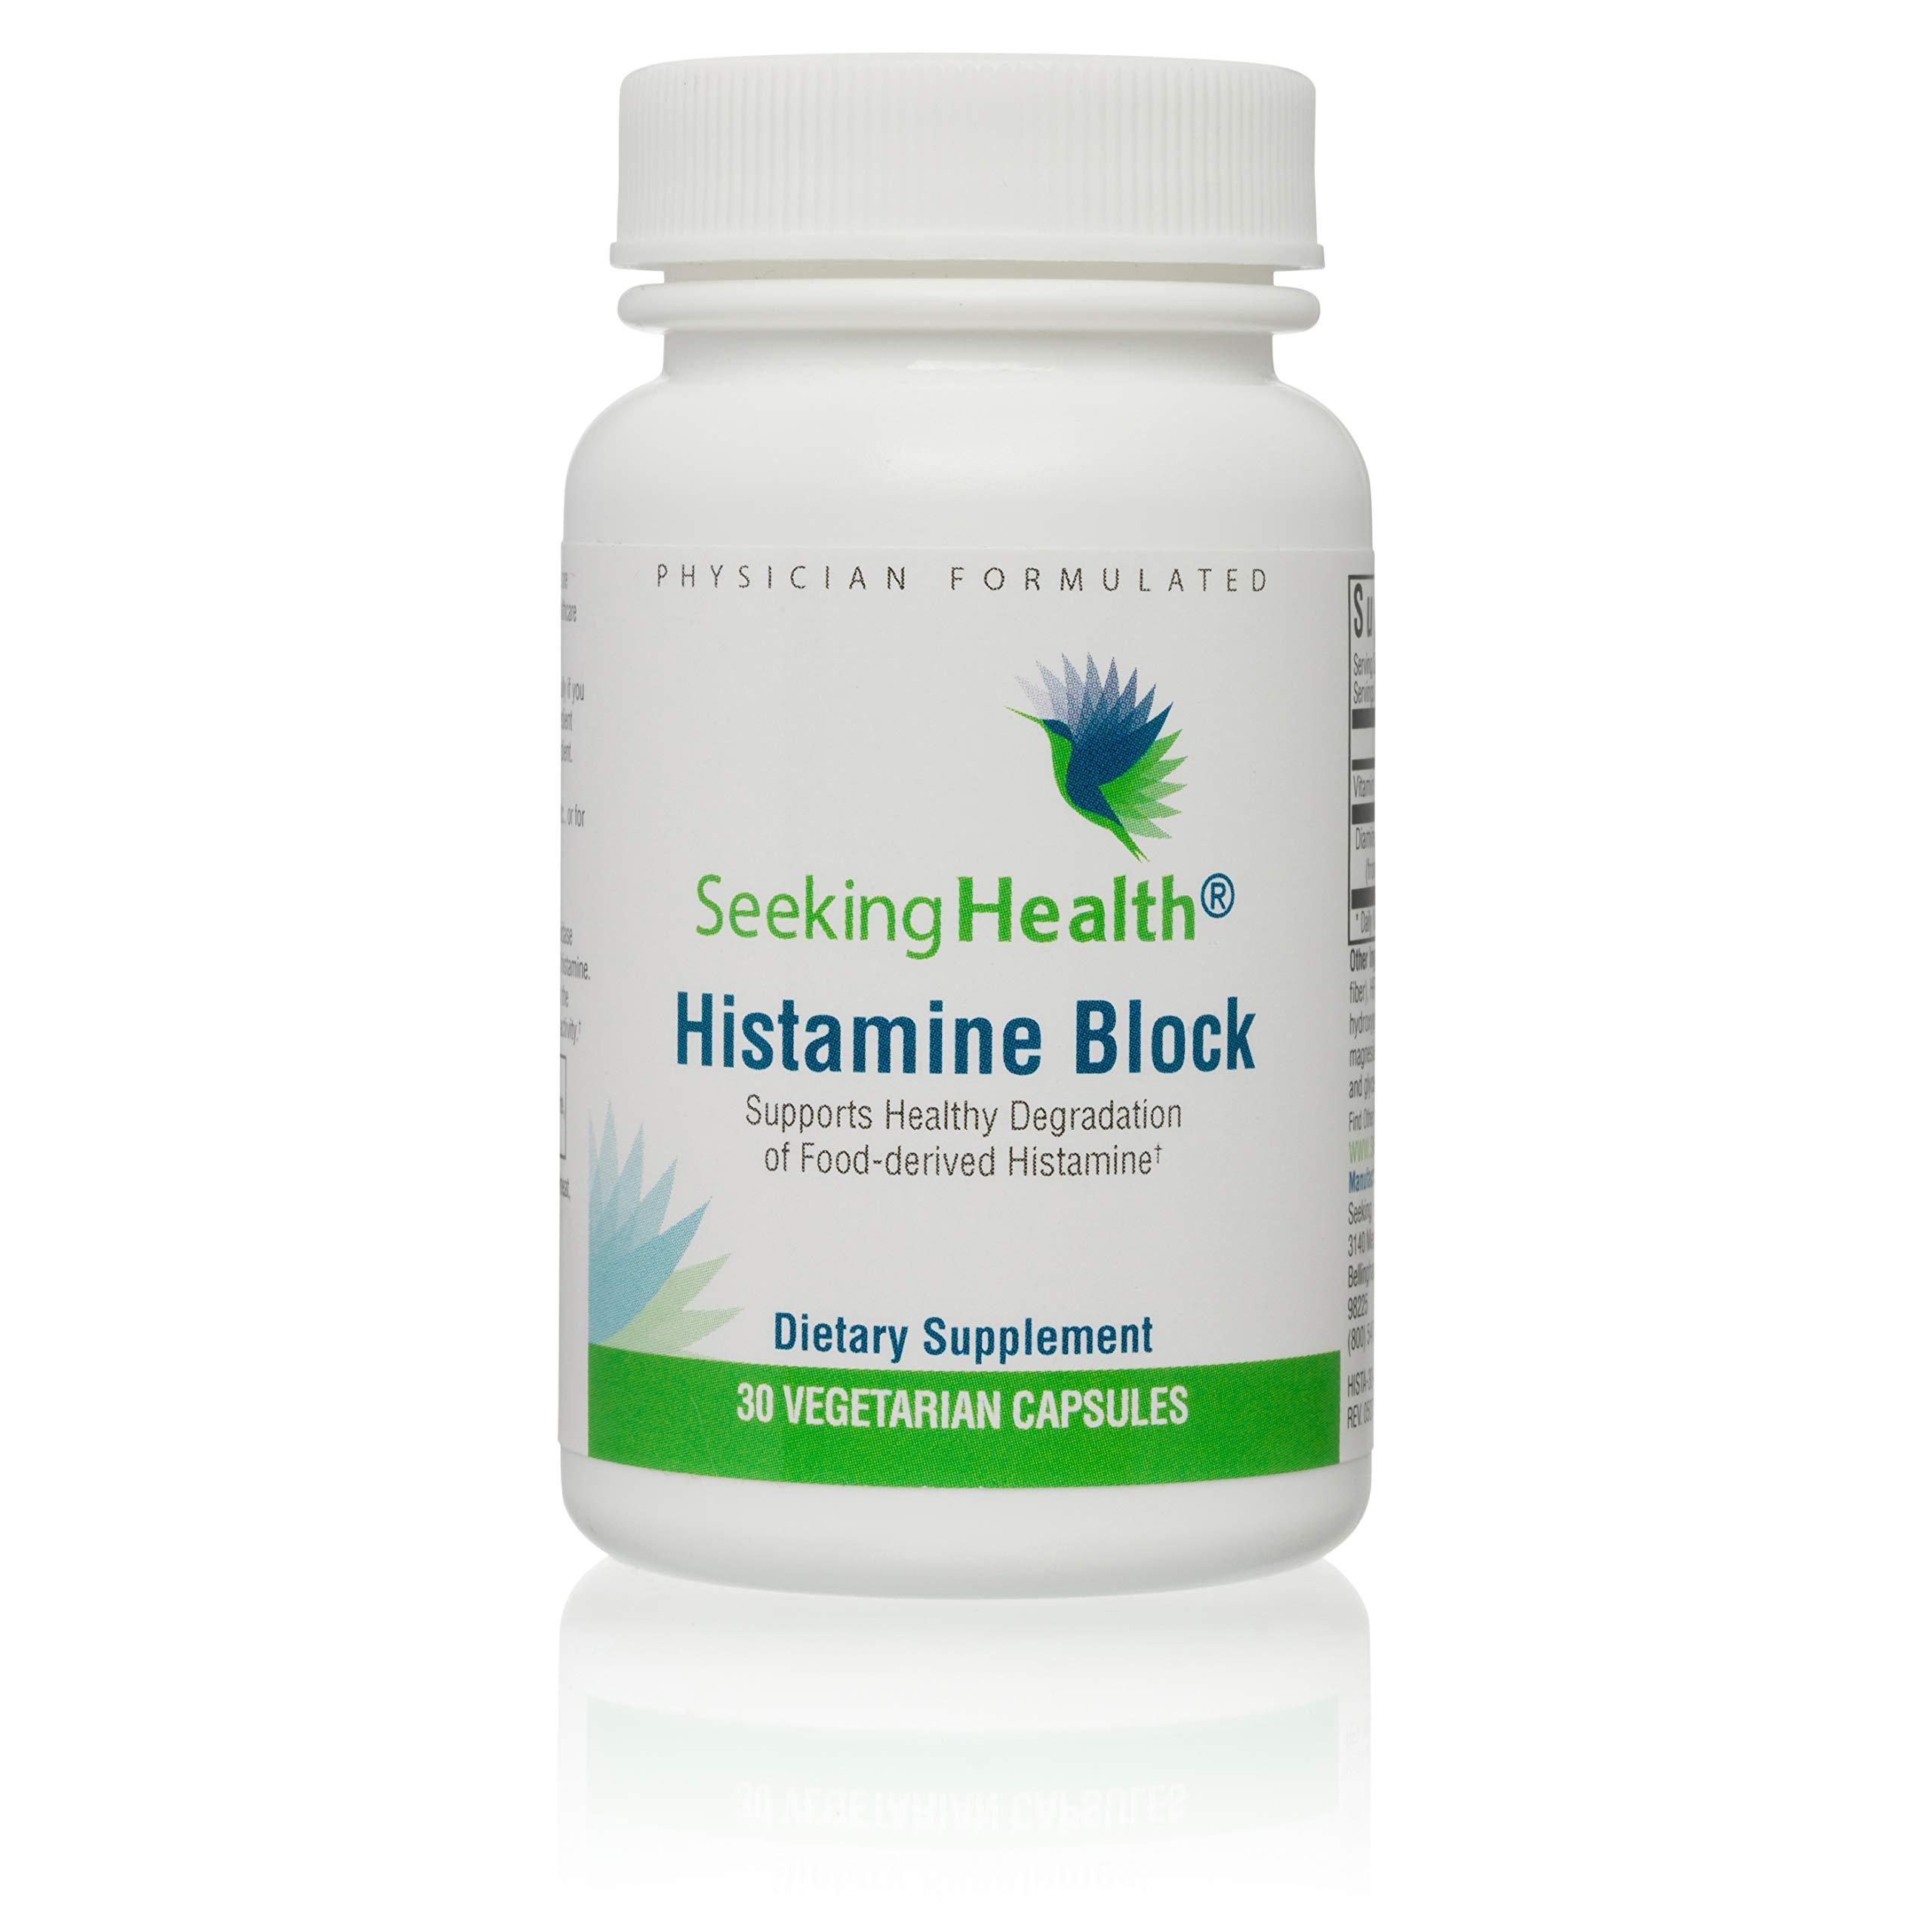 Seeking Health | Histamine Block | DAO Supplement Enzyme | Food Intolerance | Histamine Intolerance | GI Tract Supplements | Dhist 30 Capsules by Seeking Health